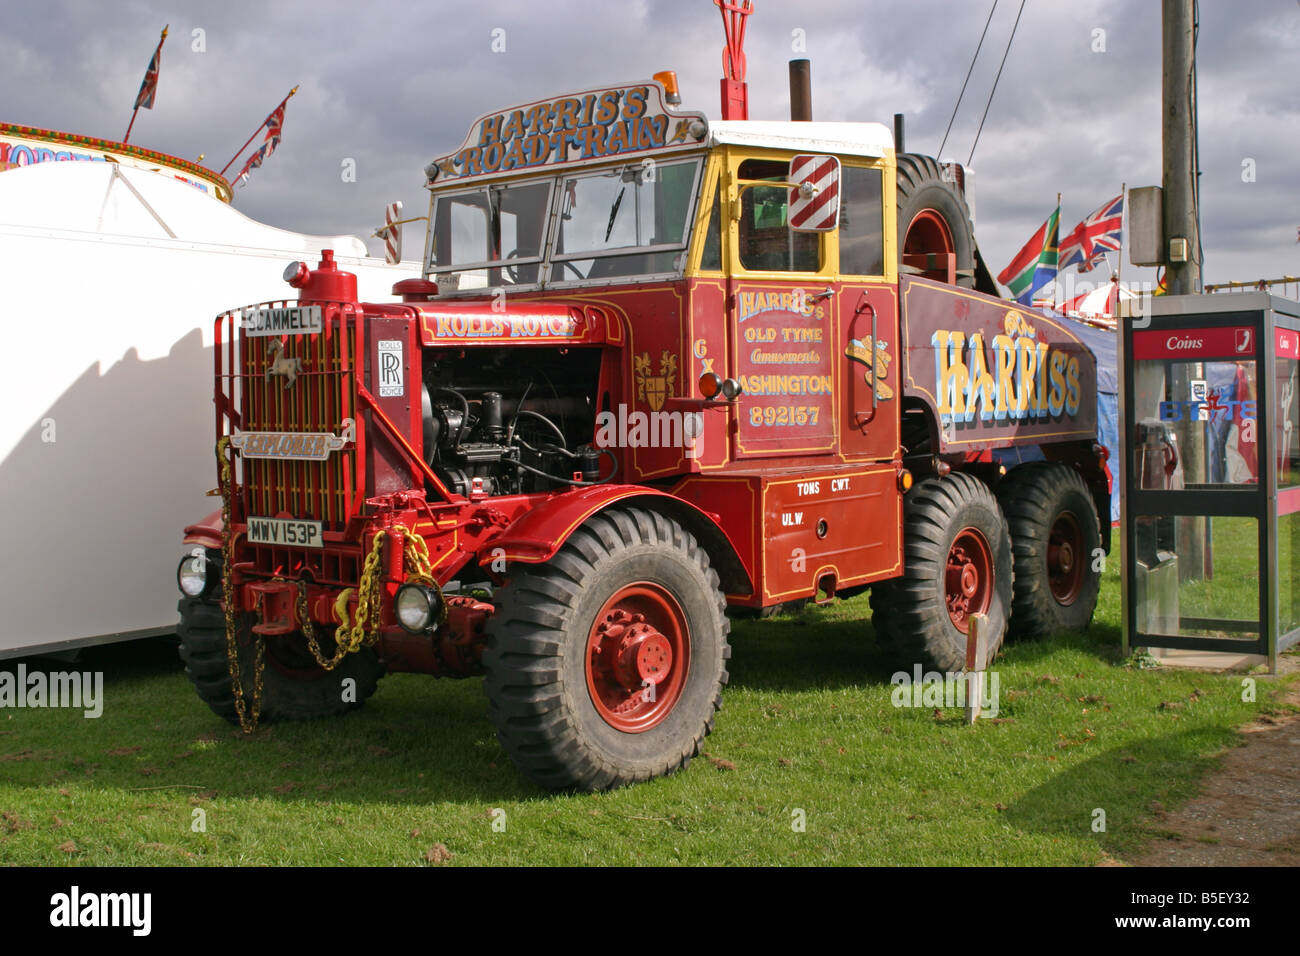 Fairground Truck Stock Photos & Fairground Truck Stock Images - Alamy